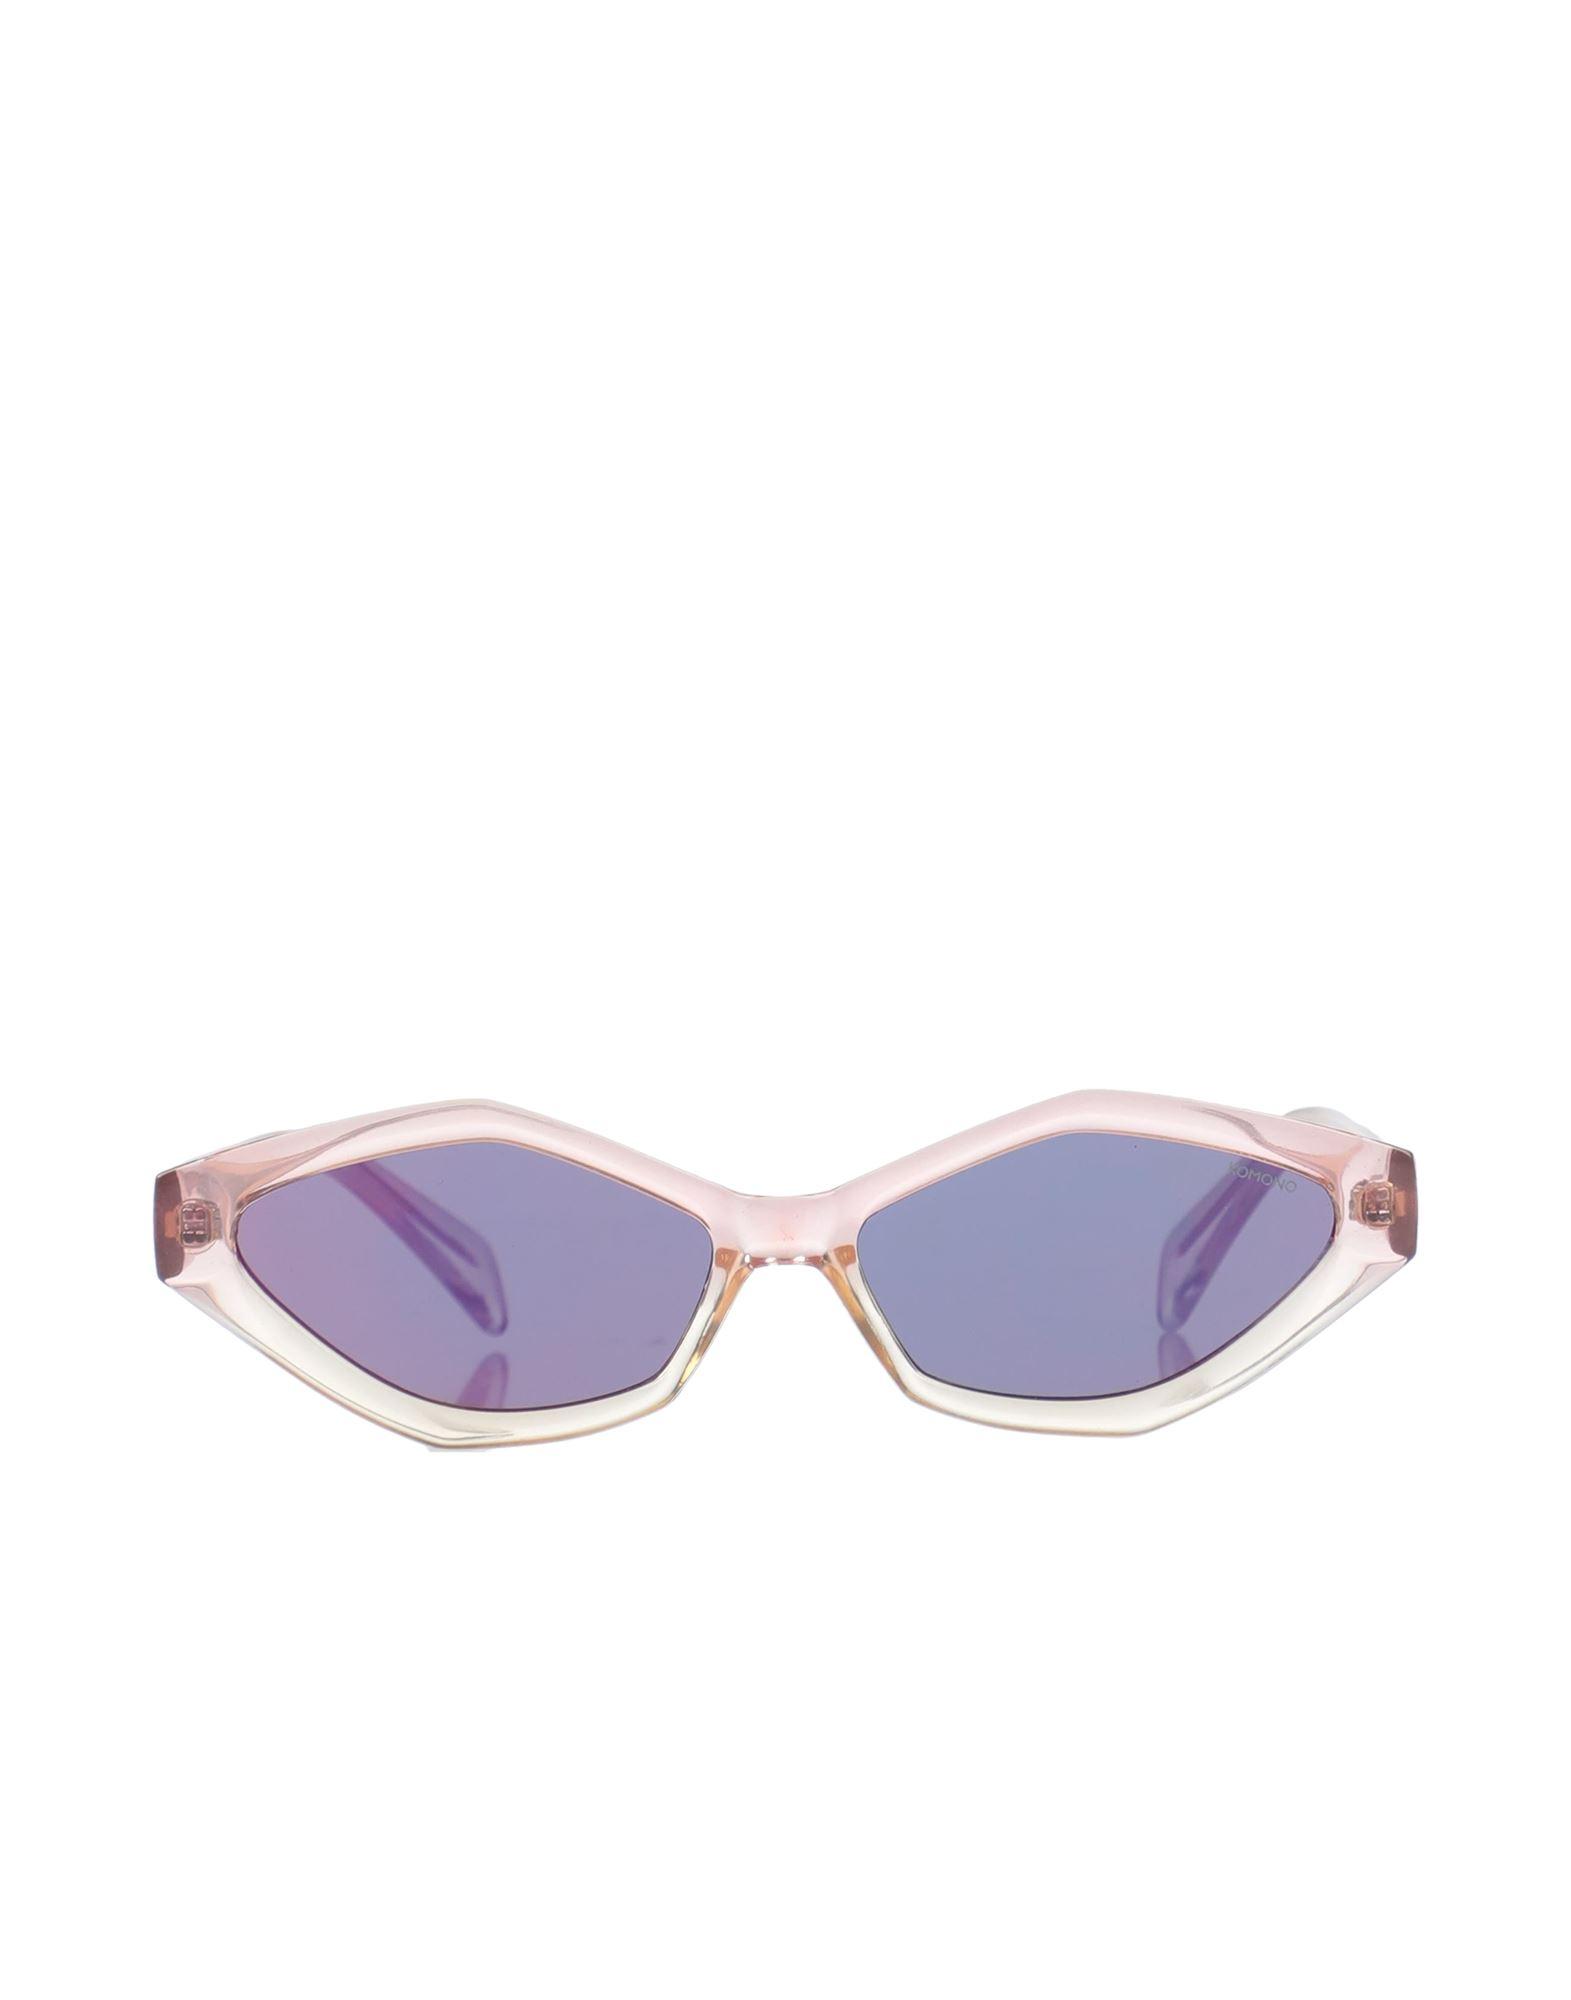 KOMONO Sunglasses - Item 46740916